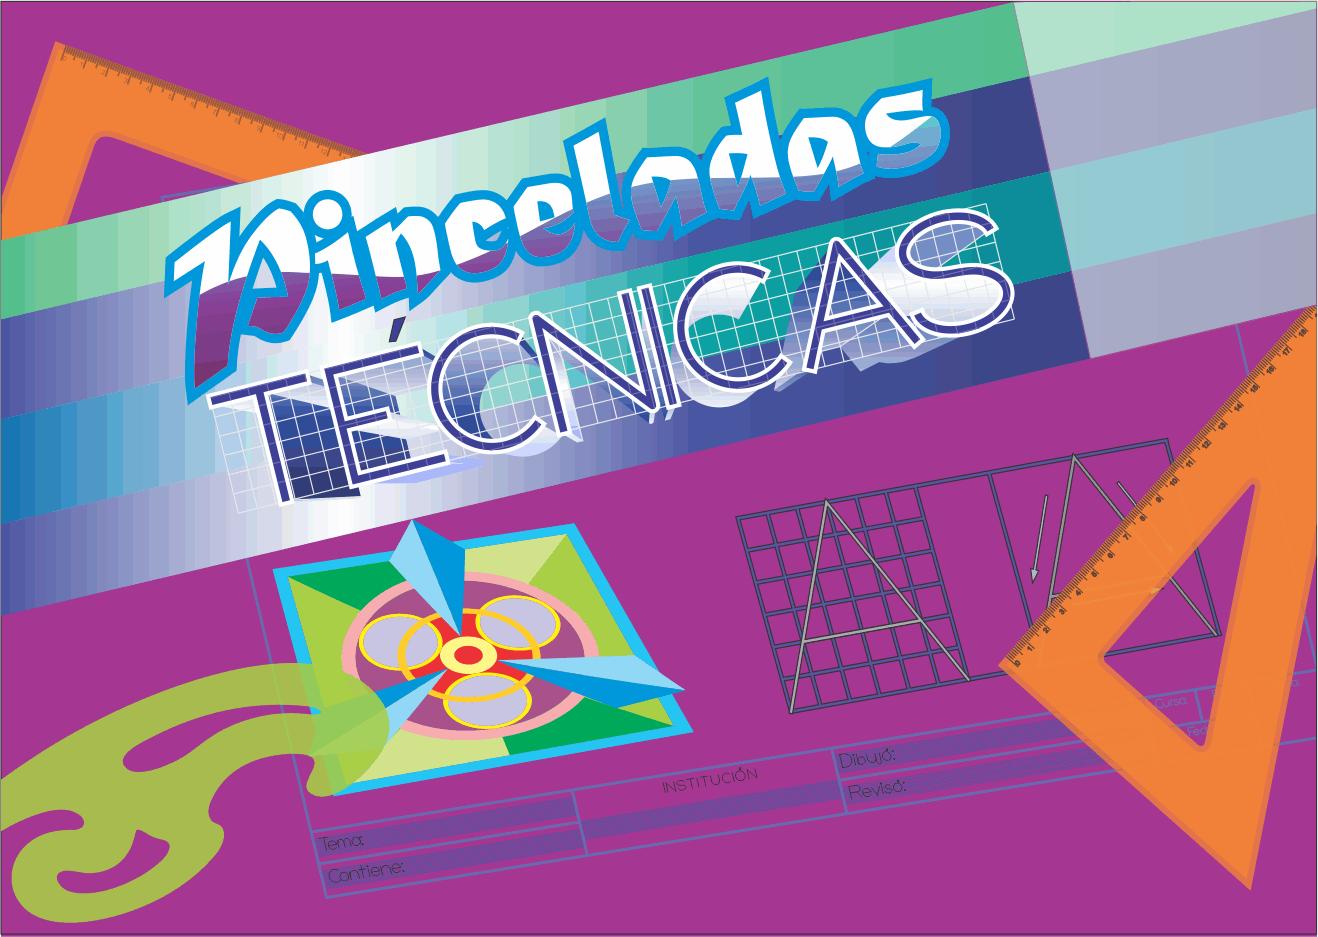 https://edicionesayp.com/wp-content/uploads/2019/09/PORTAFOLIO-PINC-TECN-W.png